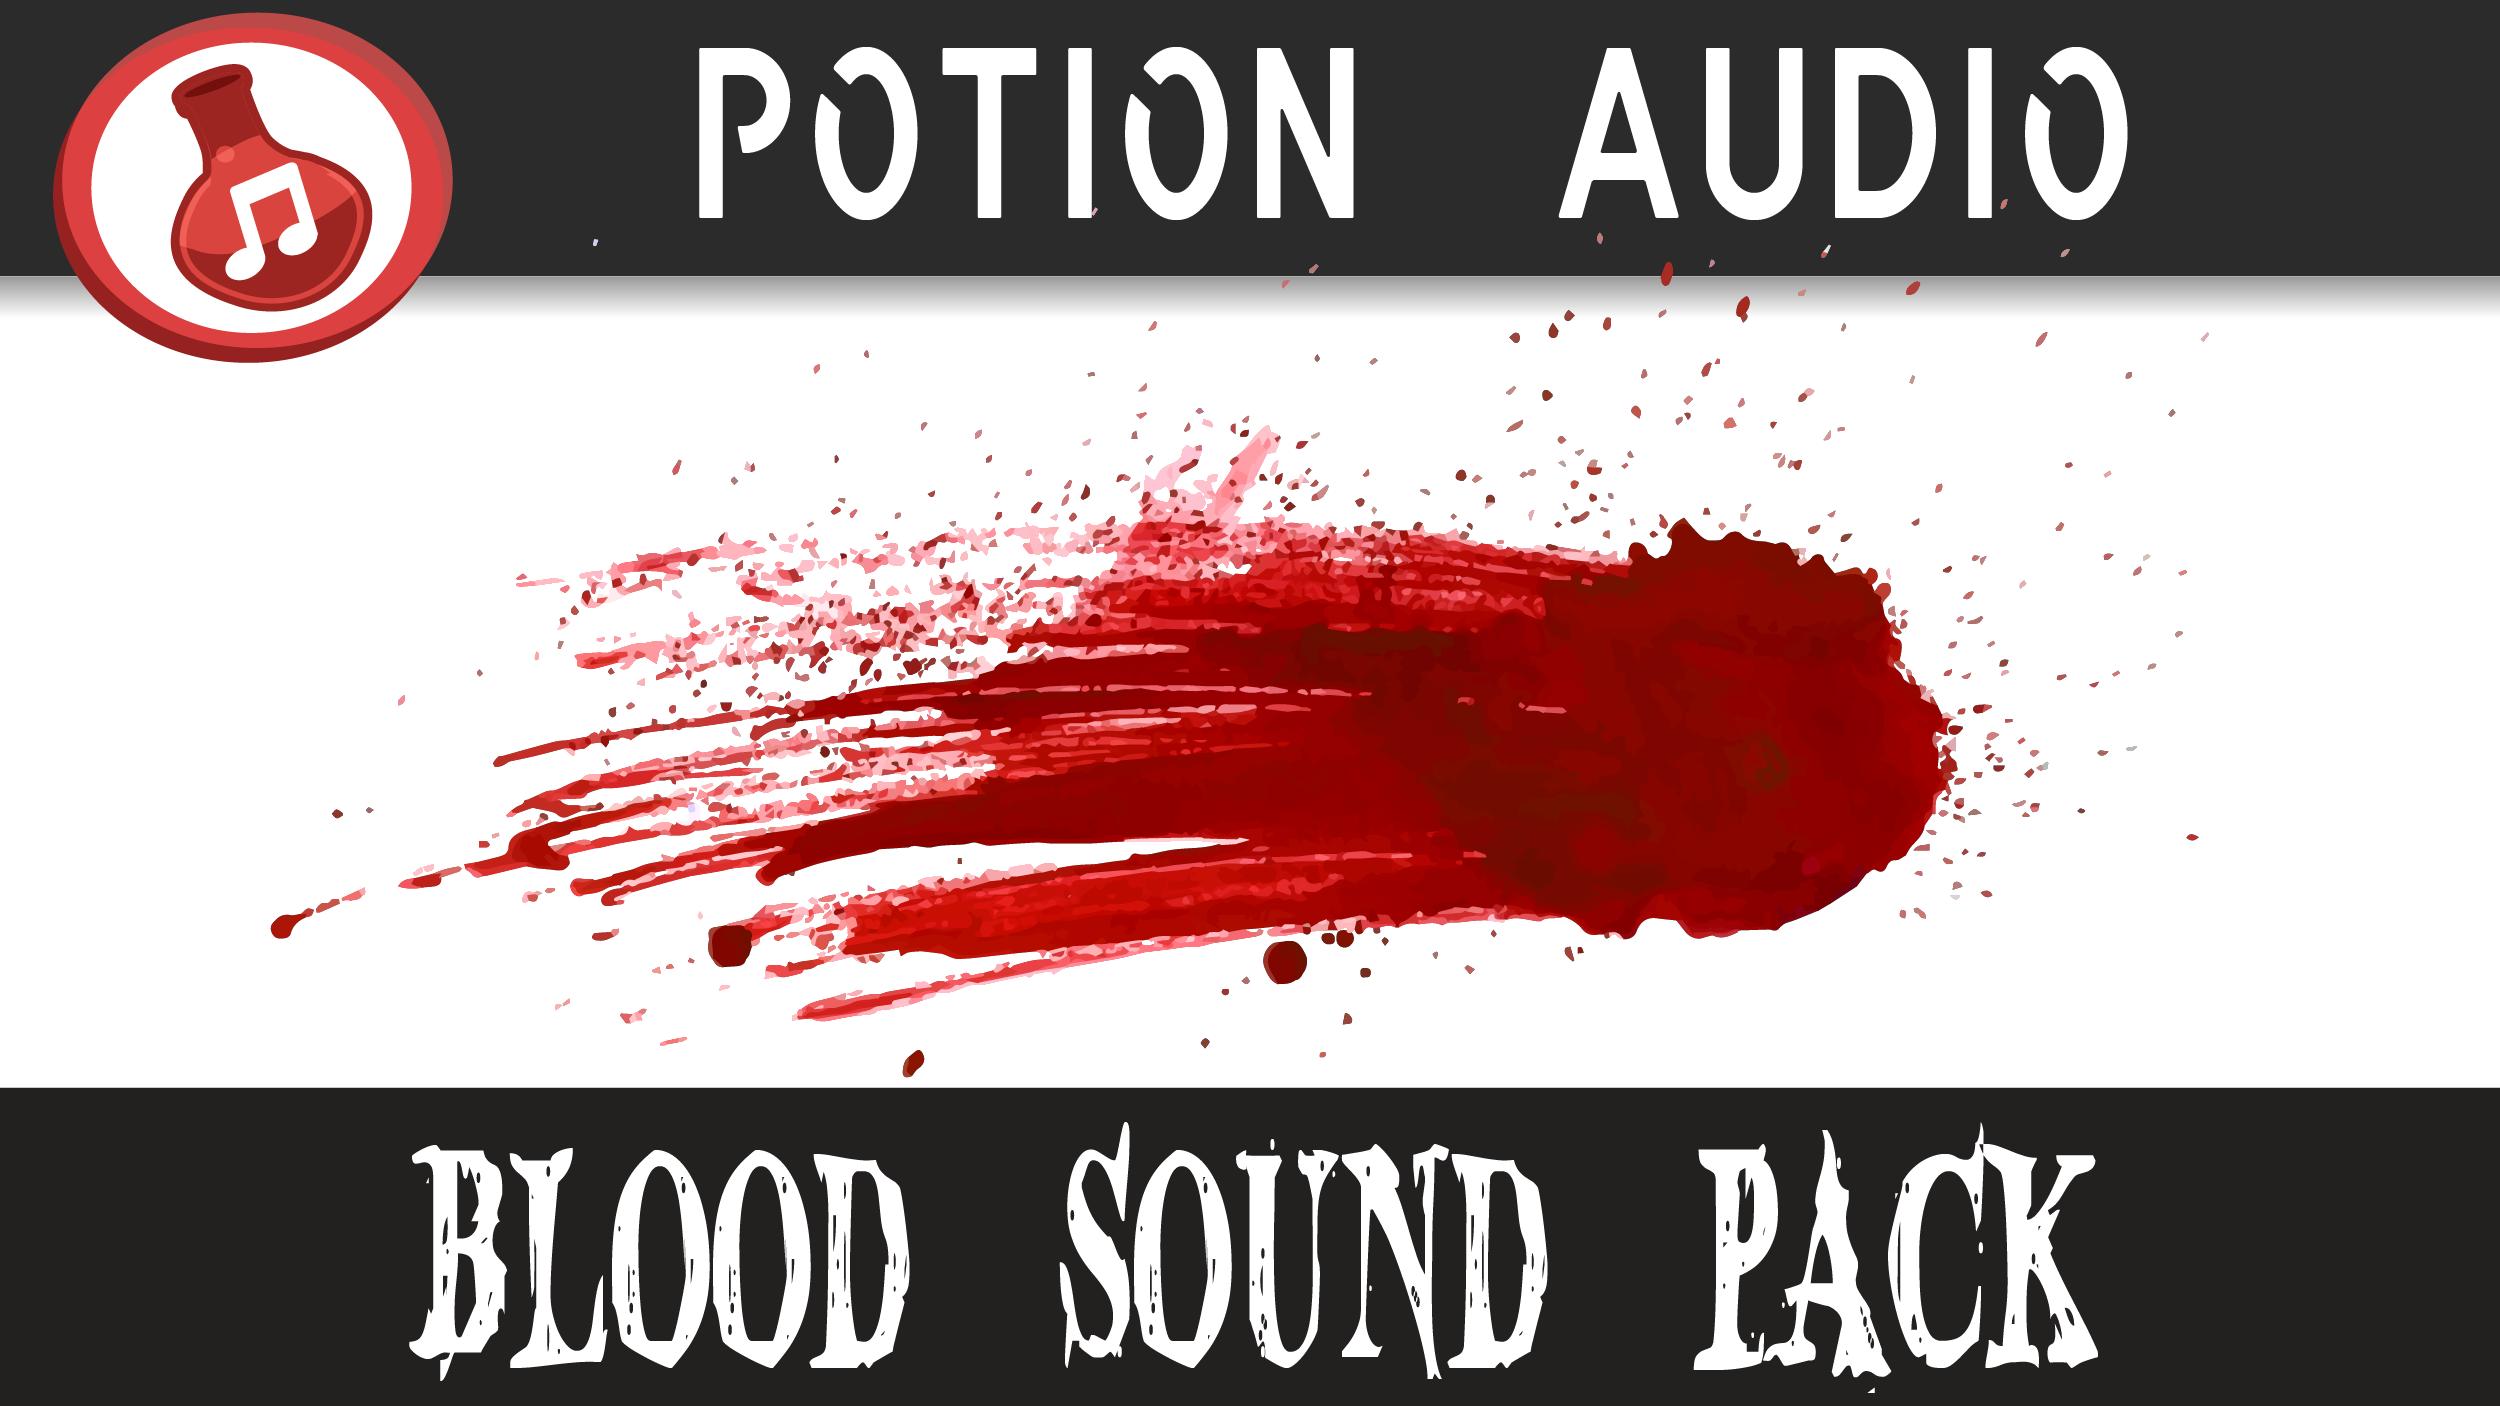 Blood Sound Pack